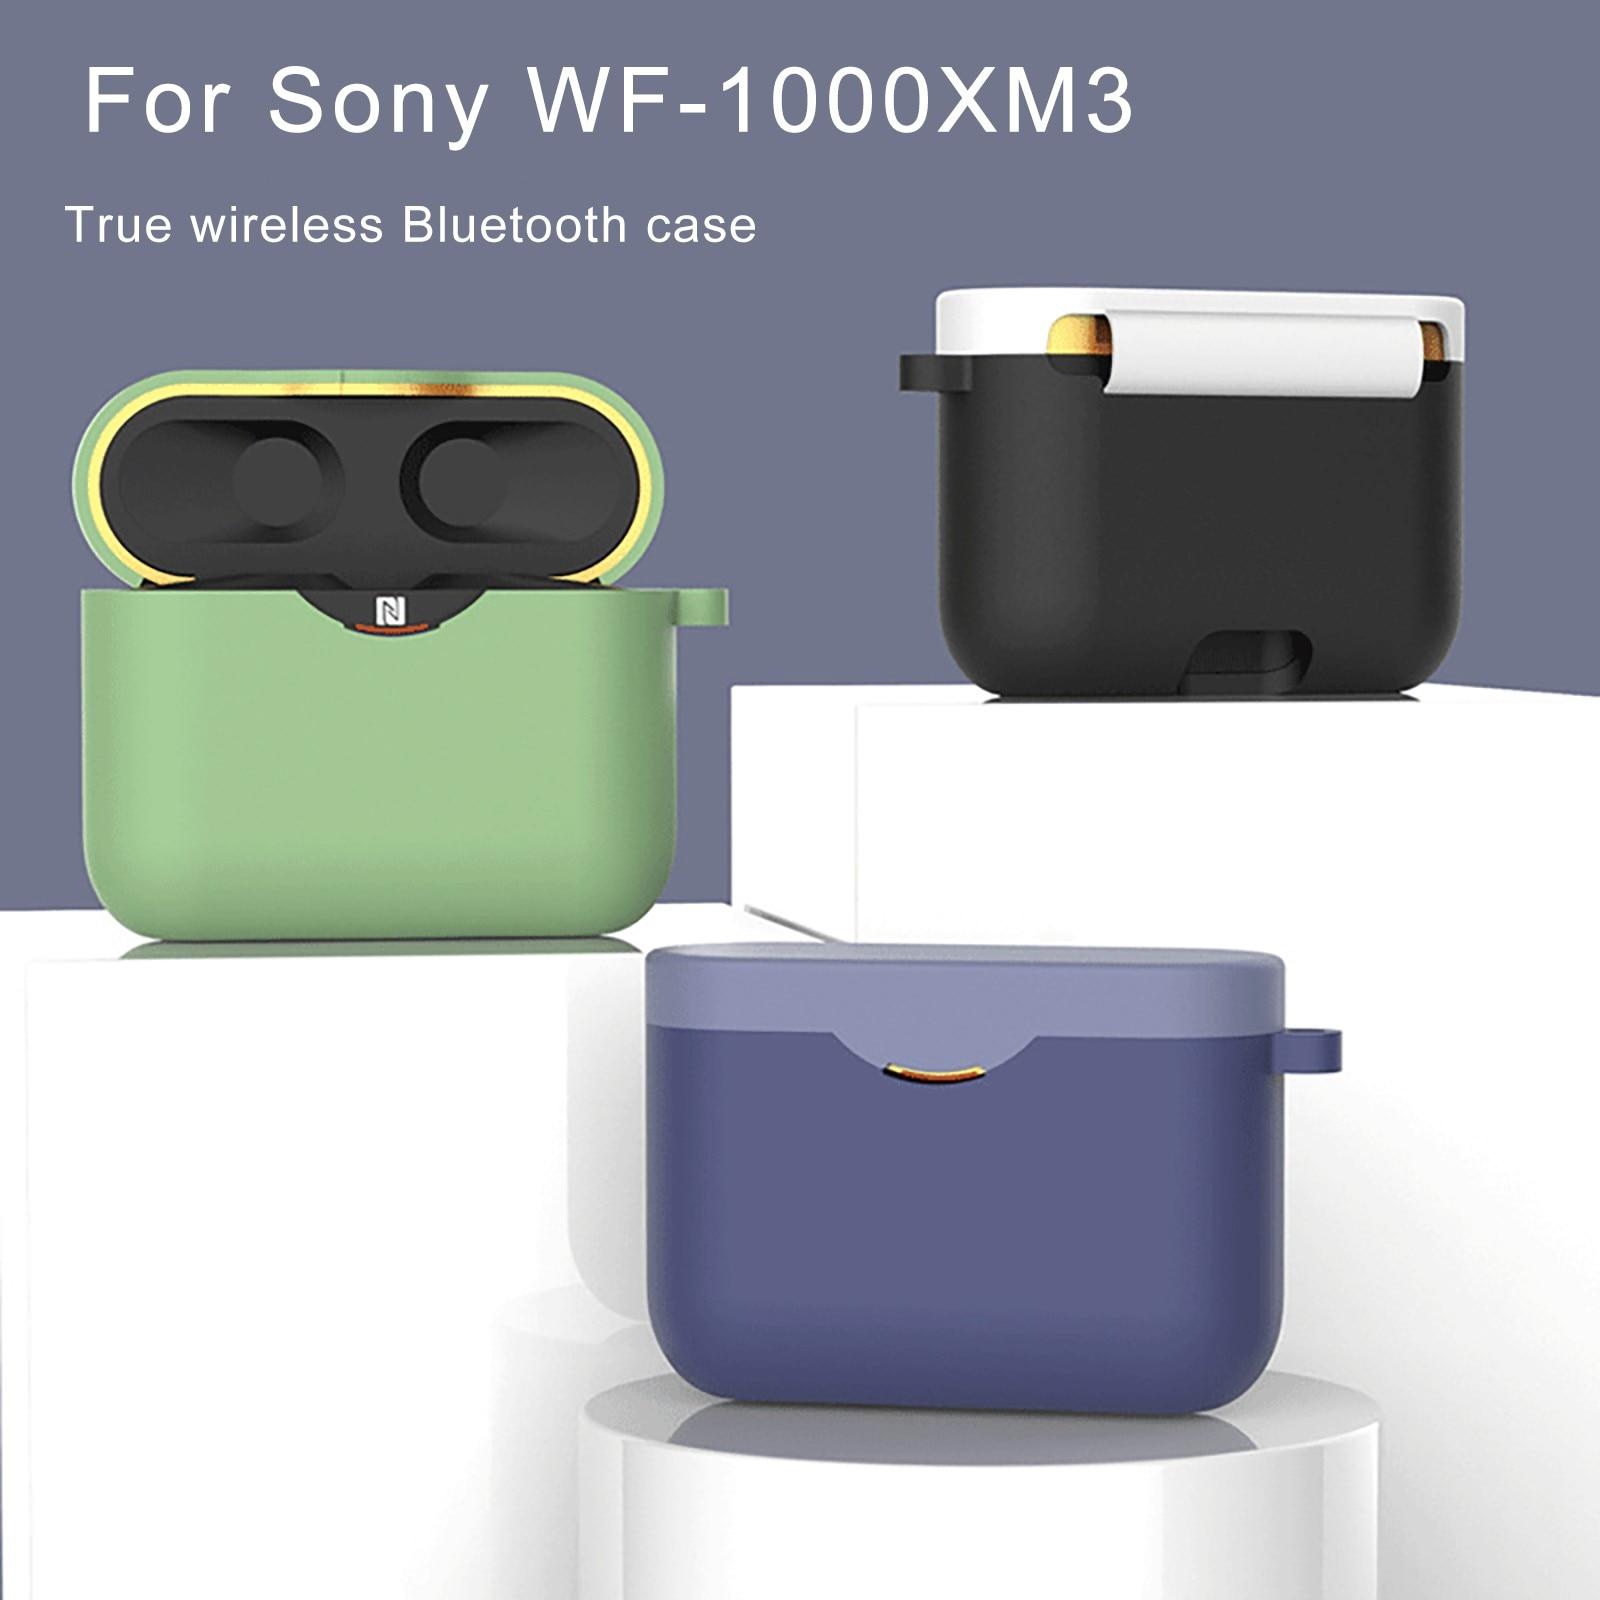 Funda de silicona para Sony WF-1000XM3 cubierta de carga bolsa inalámbrico estuche de auriculares